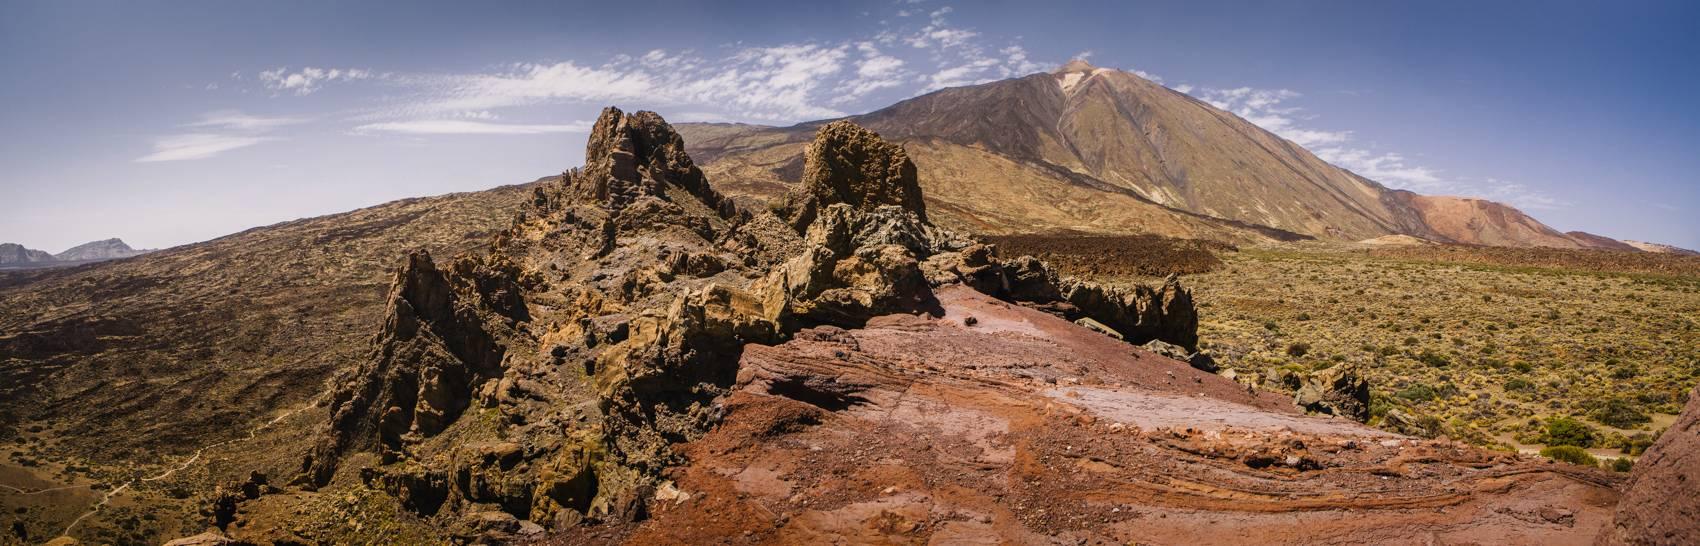 Photo Voyages : Îles Canaries #33